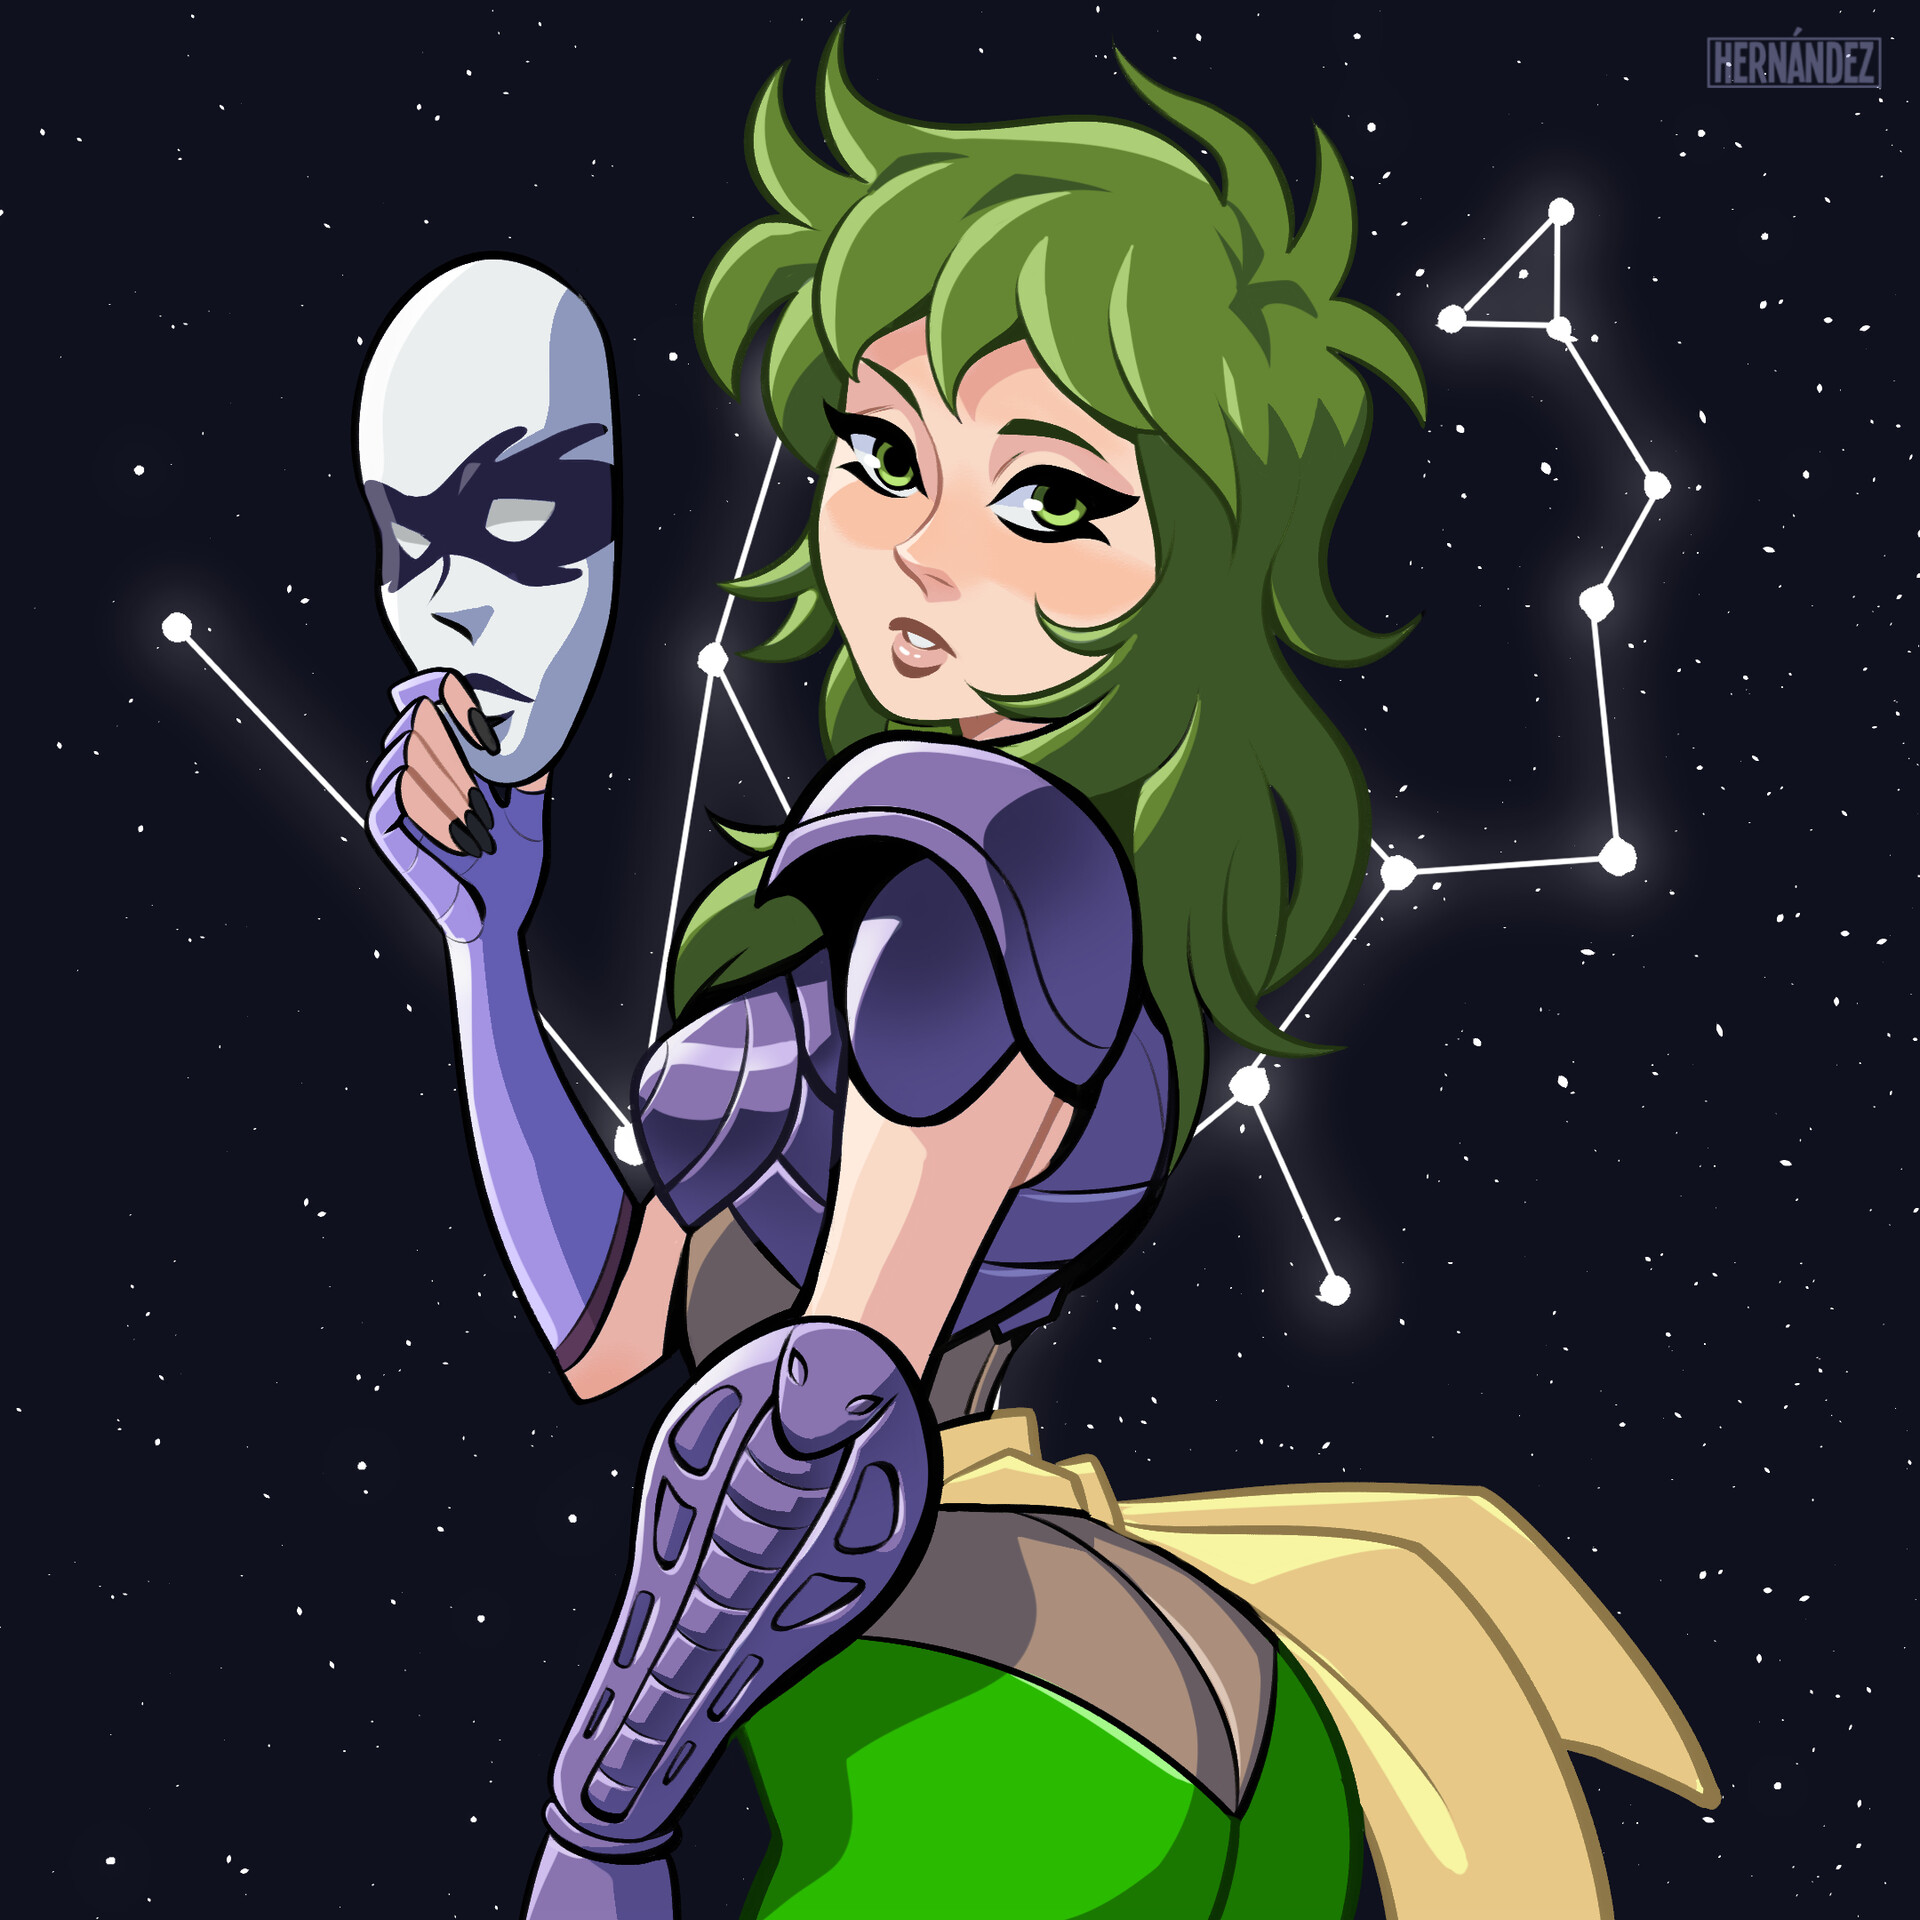 Ophiucus Shaina